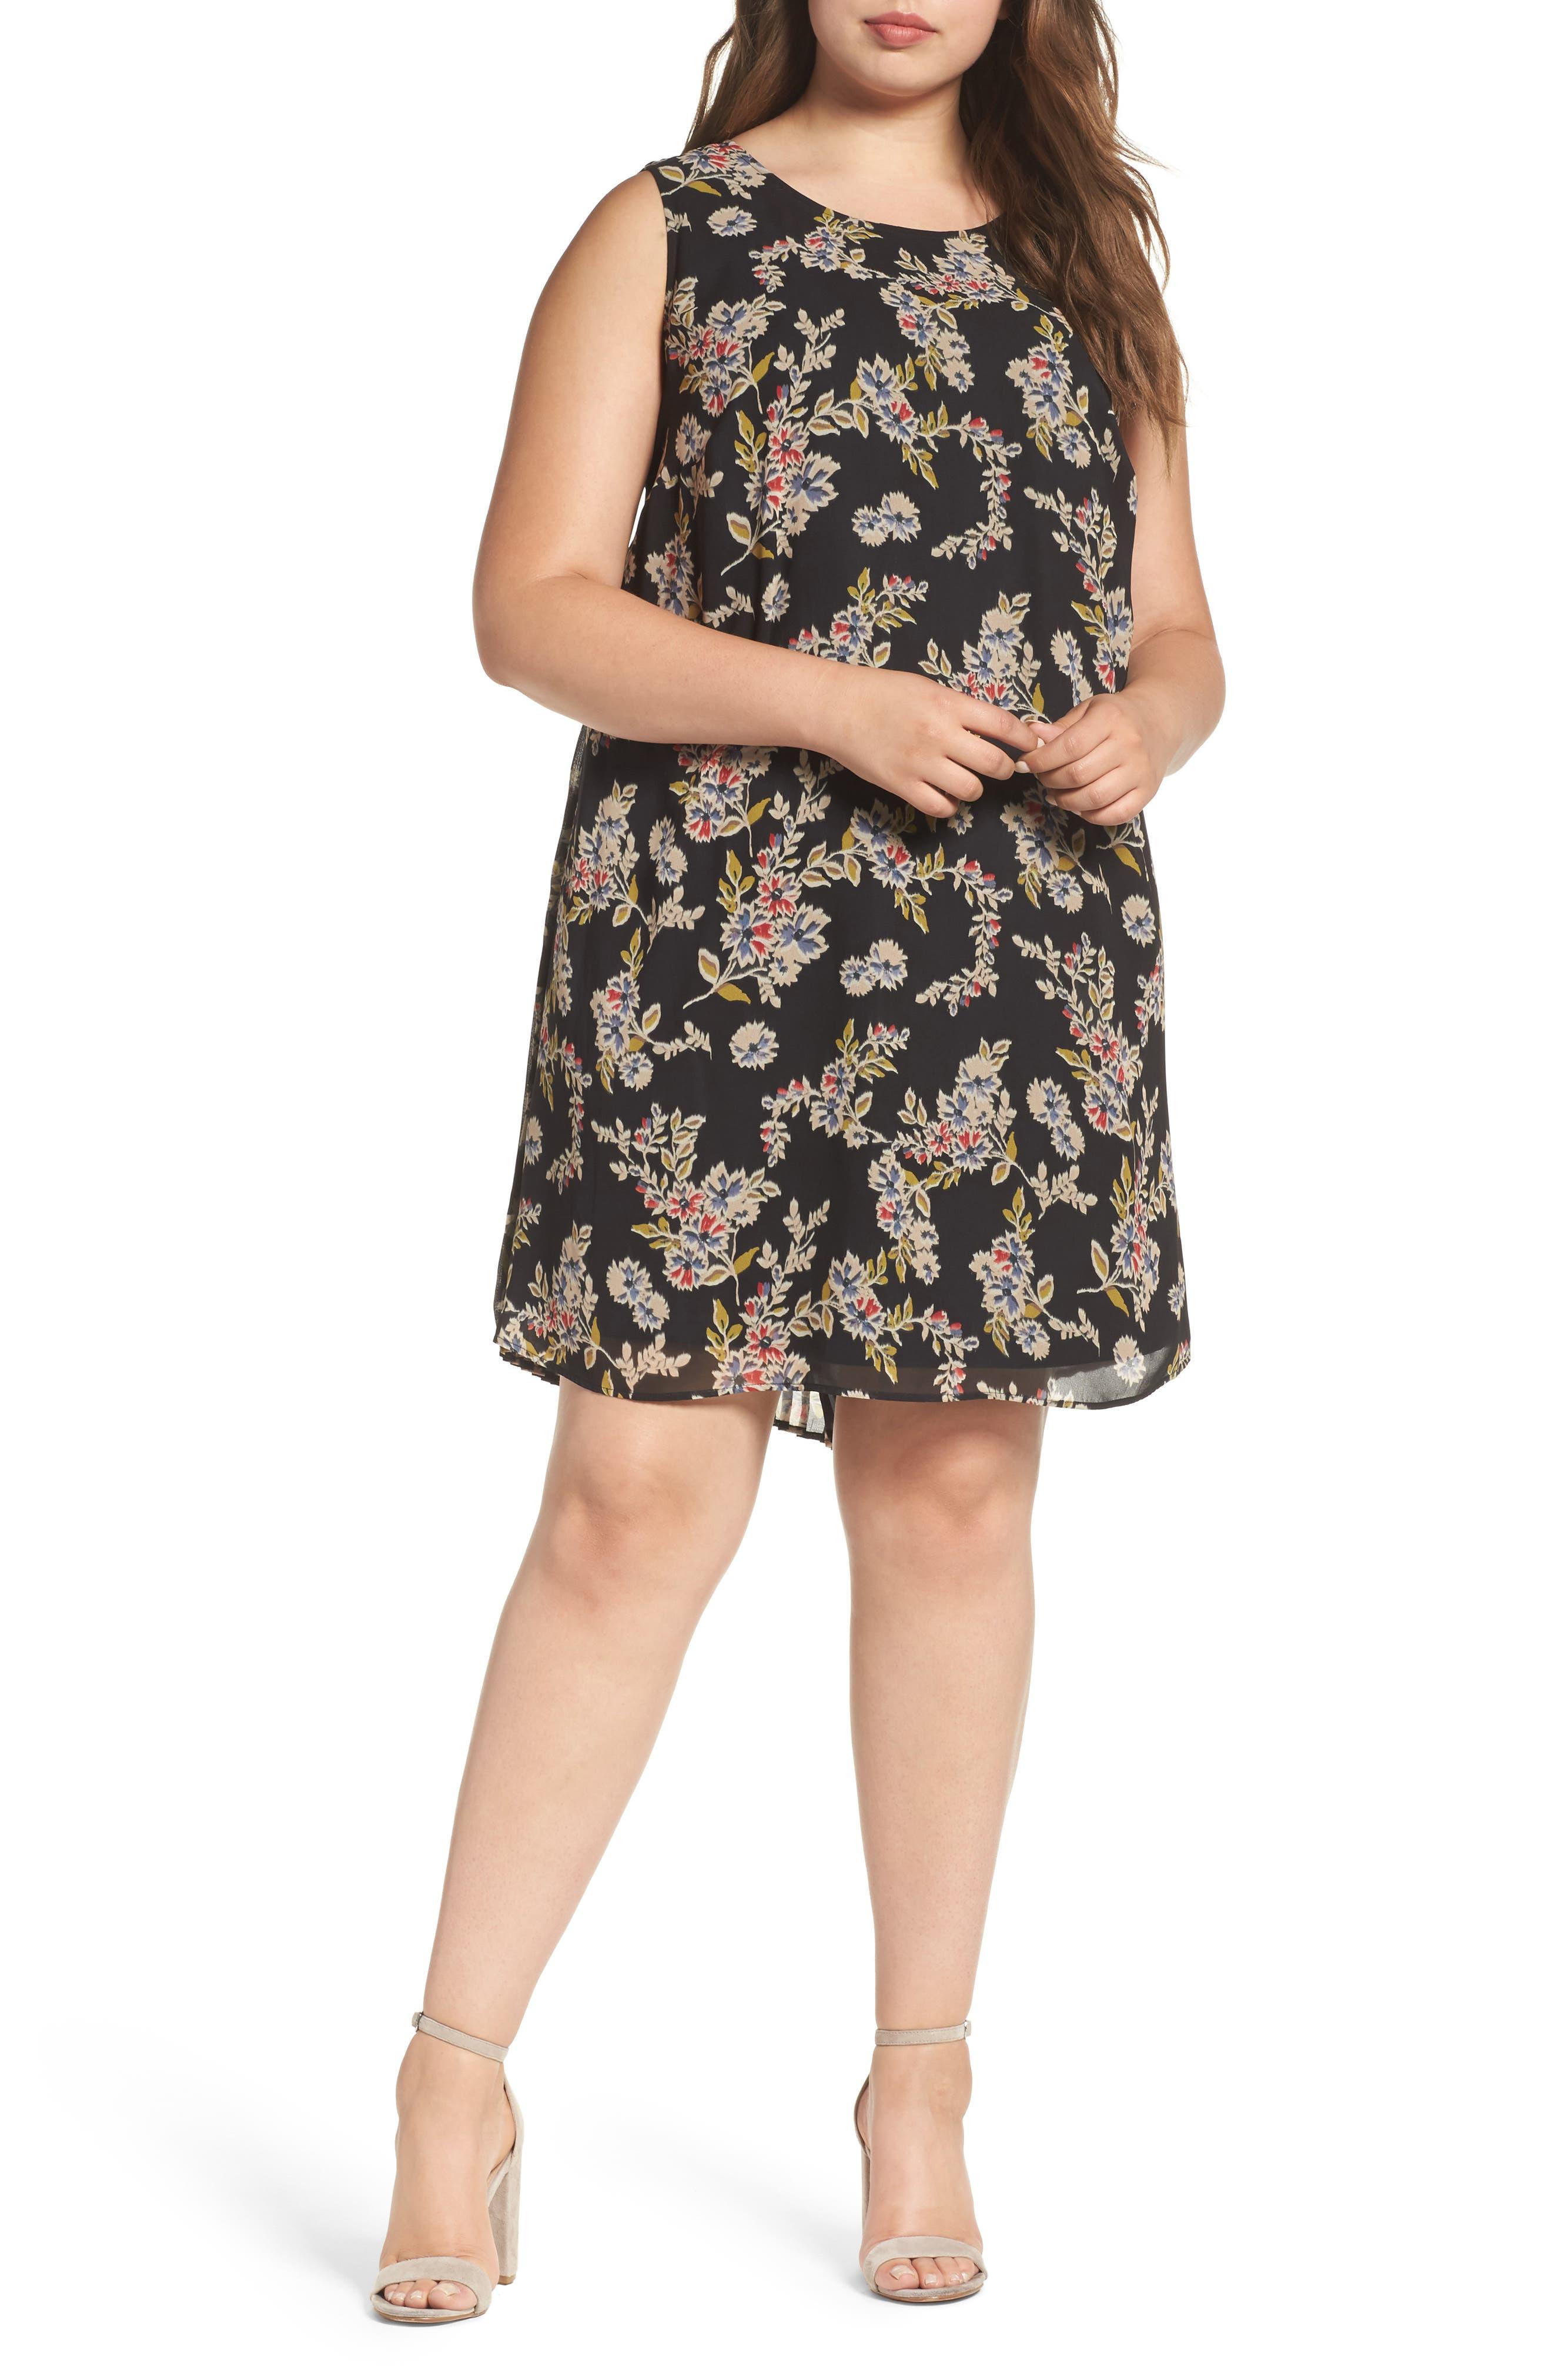 Alternate Image 1 Selected - Daniel Rainn Pleated Back Dress (Plus Size)